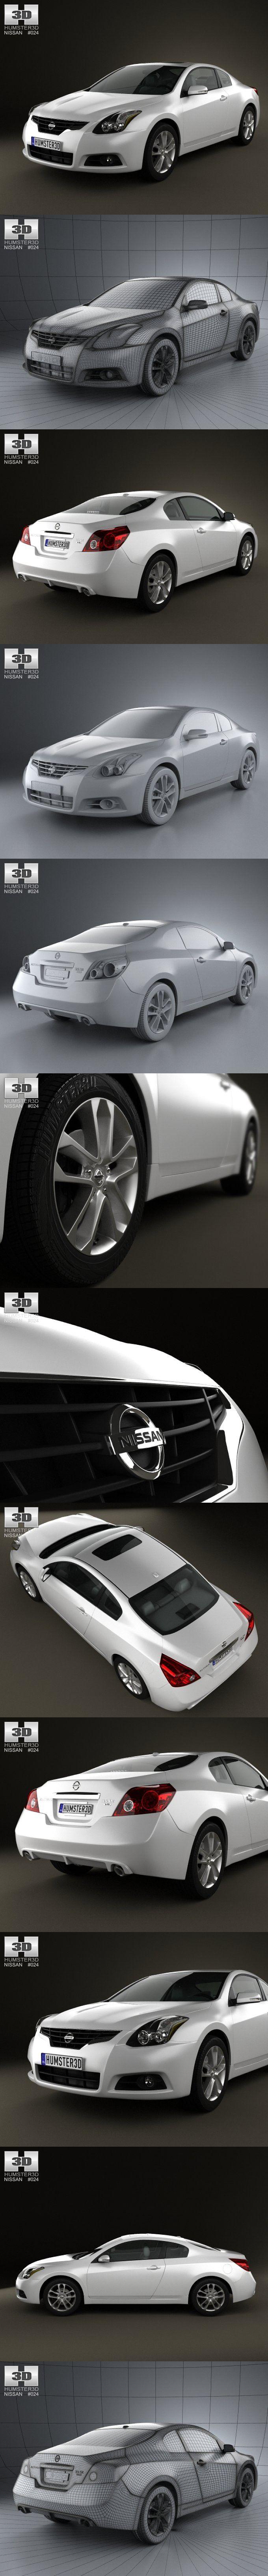 Nissan Altima coupe 2012. 3D Vehicles